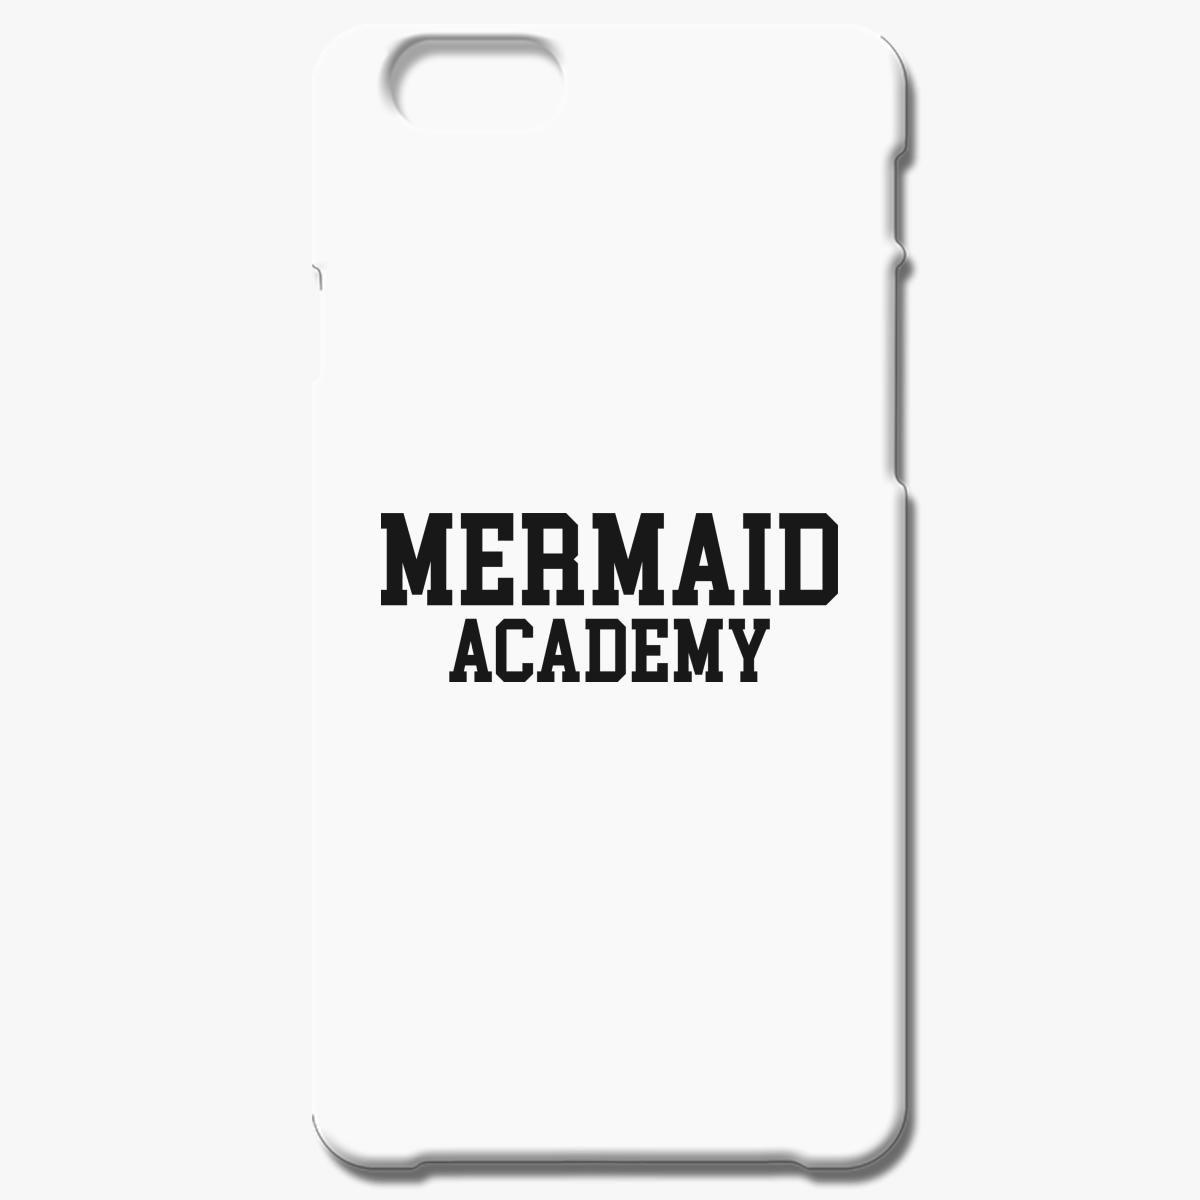 Mermaid Academy Iphone 6 6s Plus Case